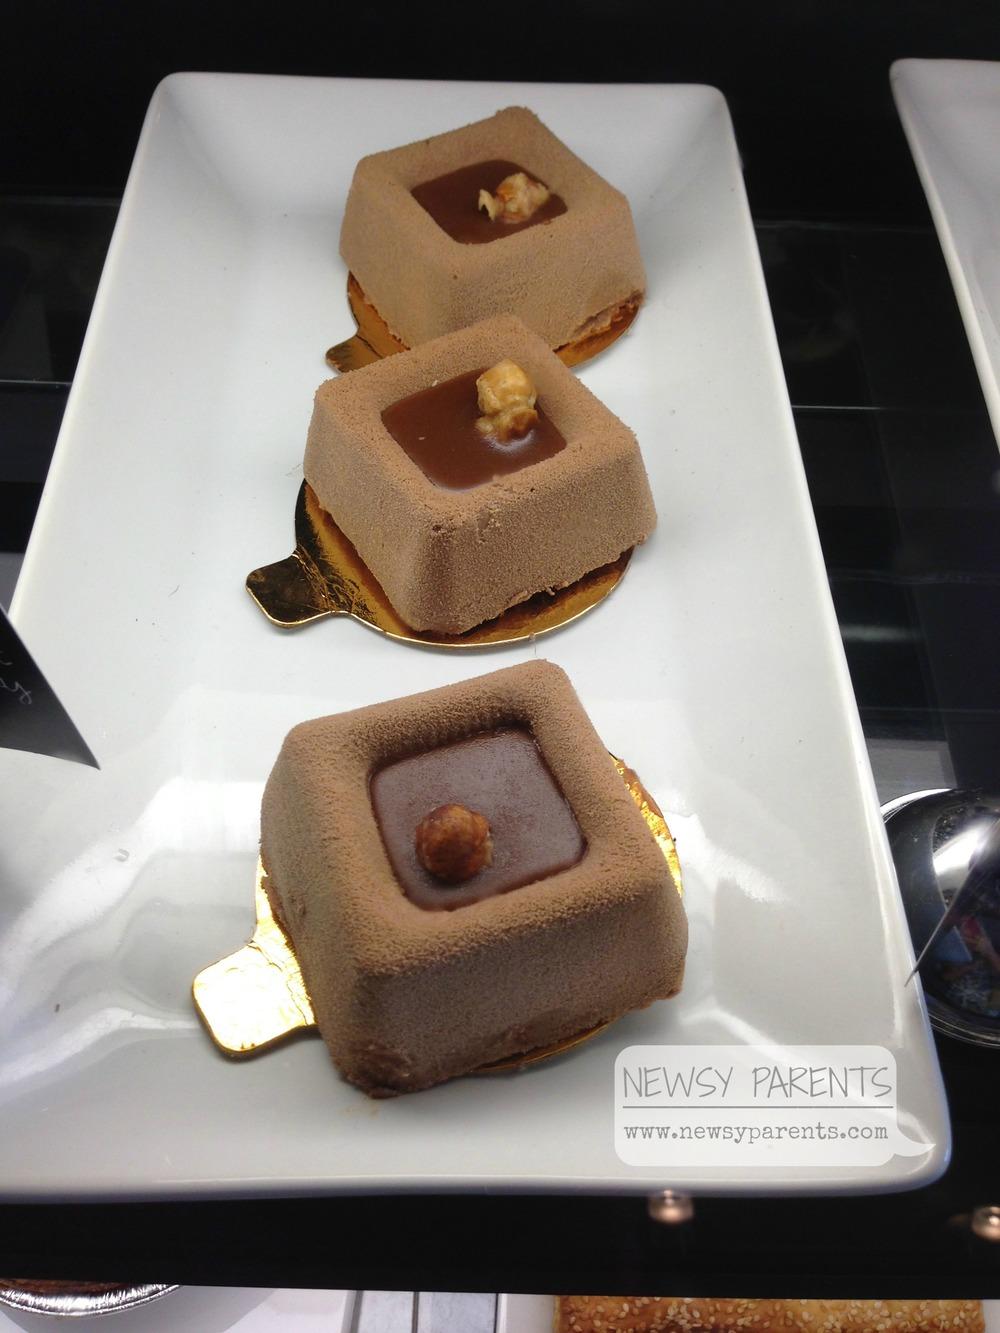 Newsy Parents Hamptons dessert.jpg